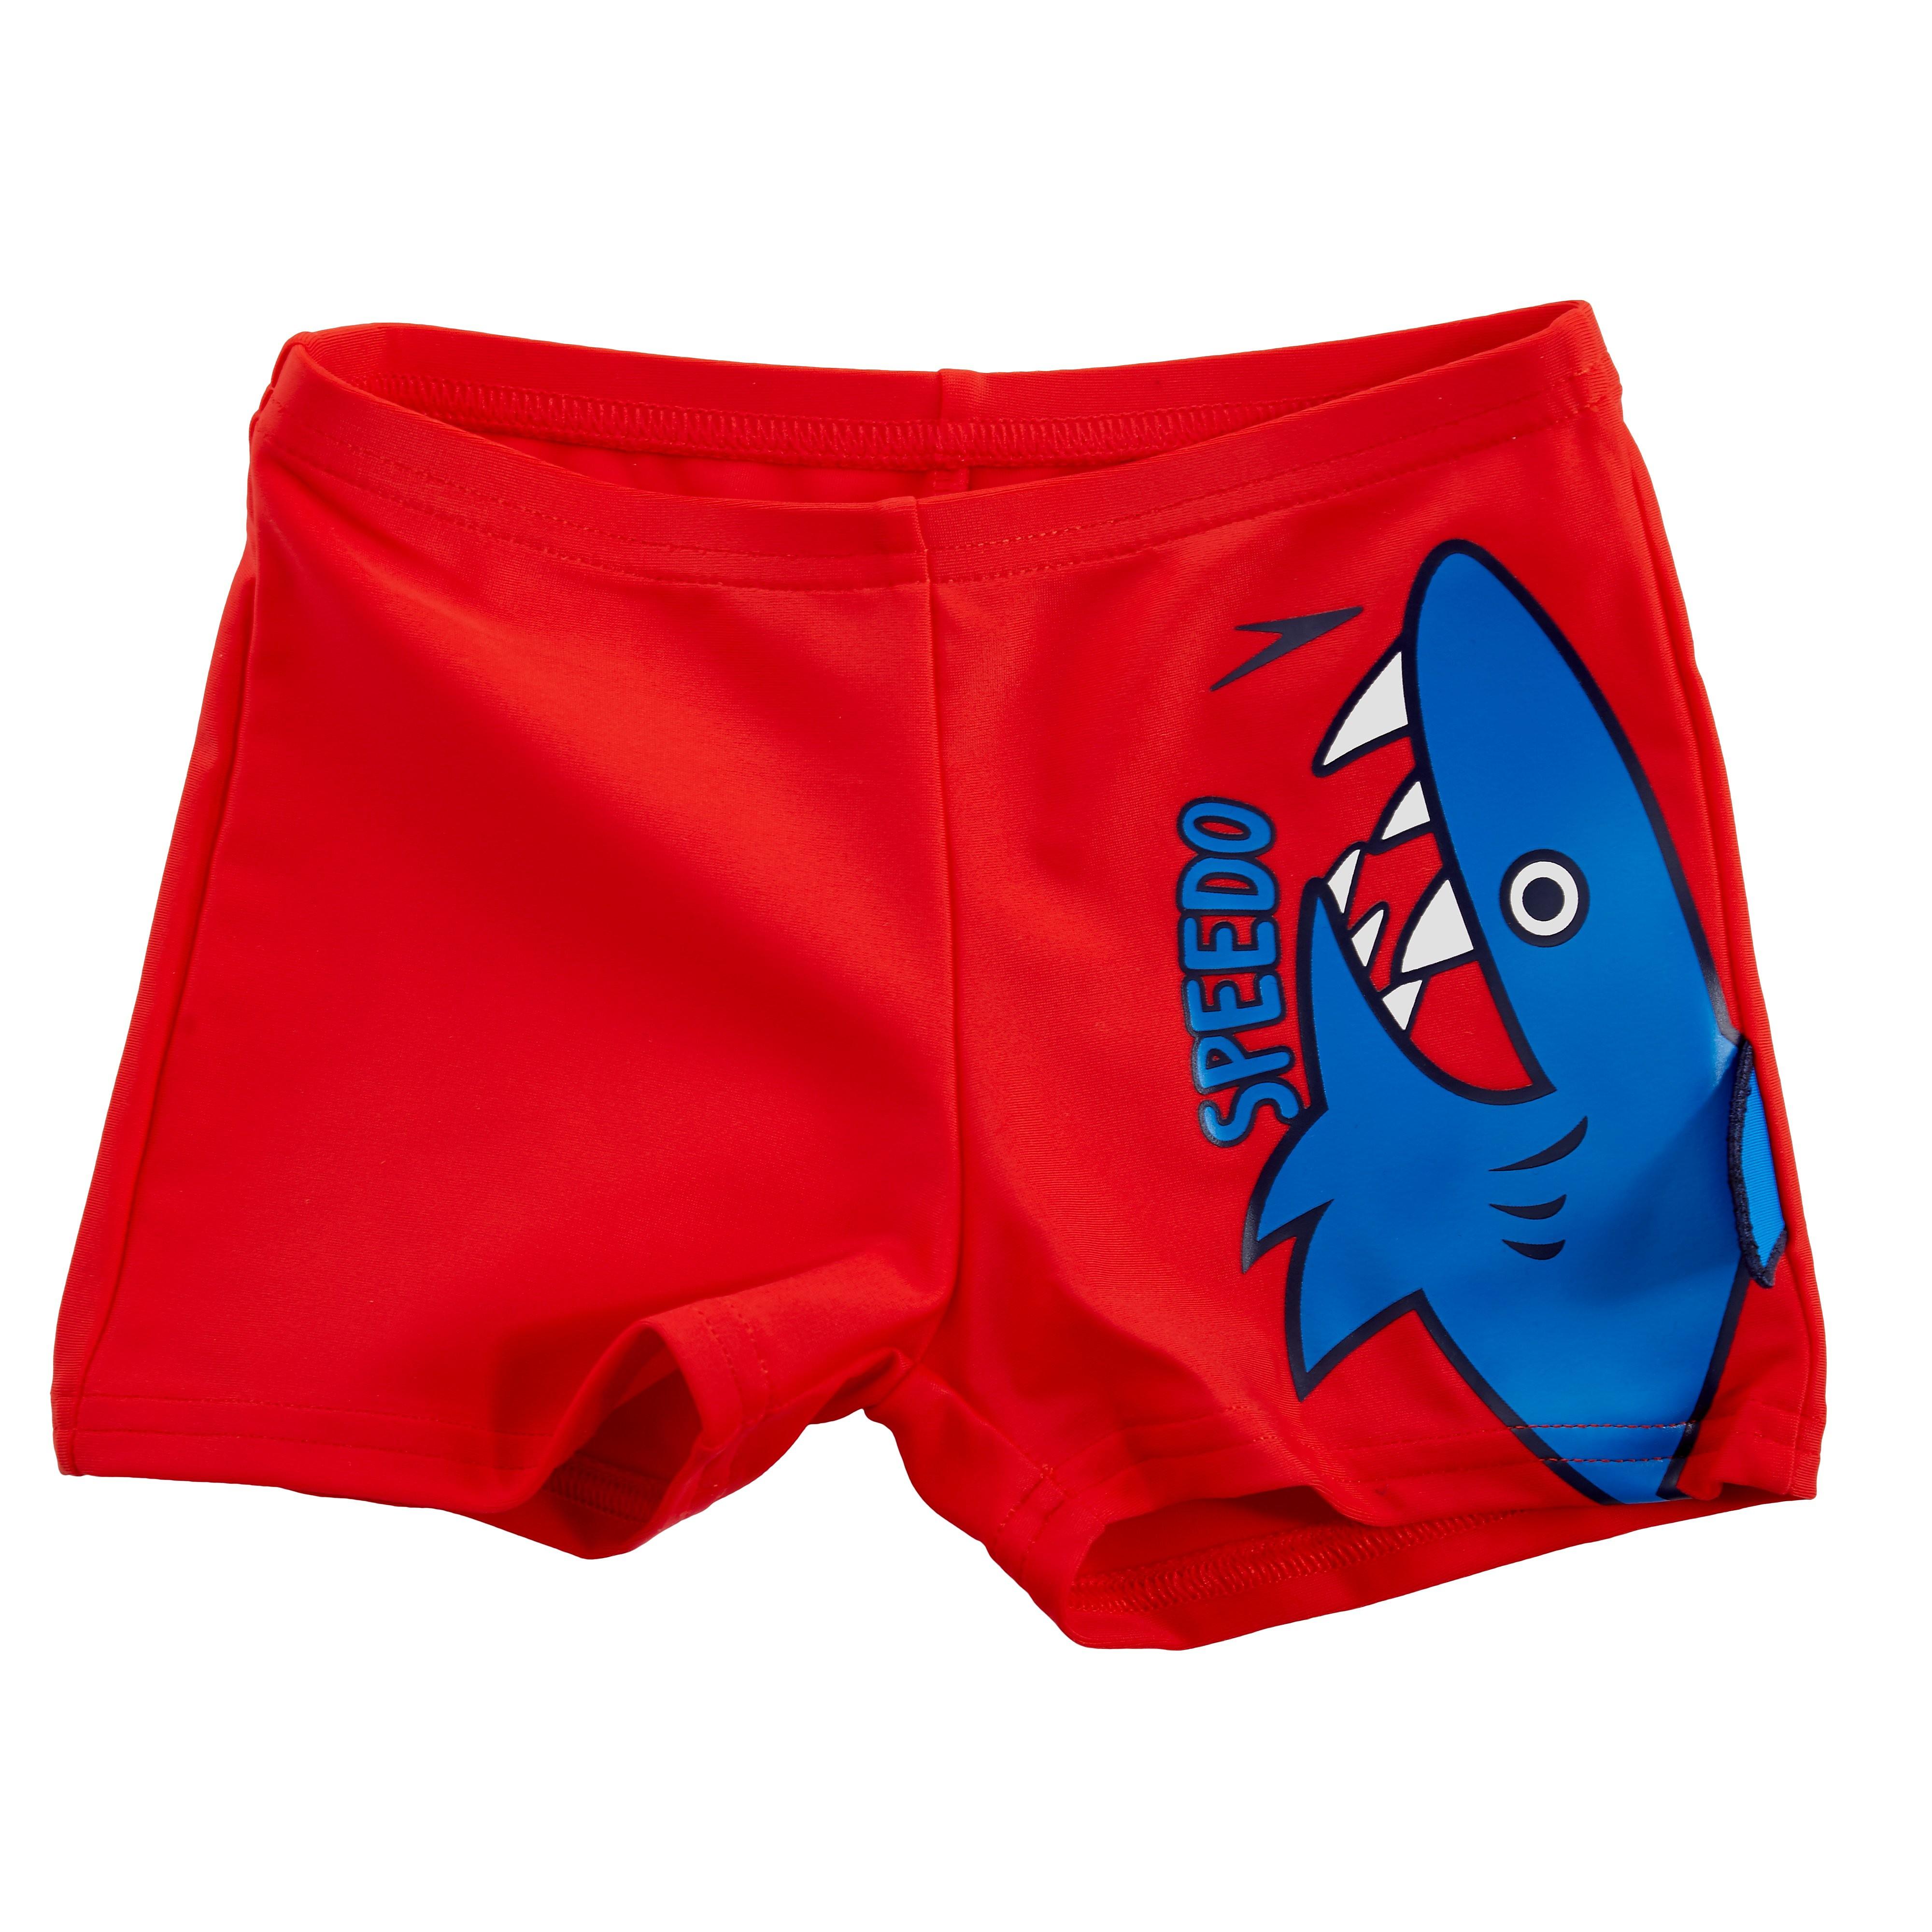 Speedo Fin Friends Junior Boys Swim Shorts